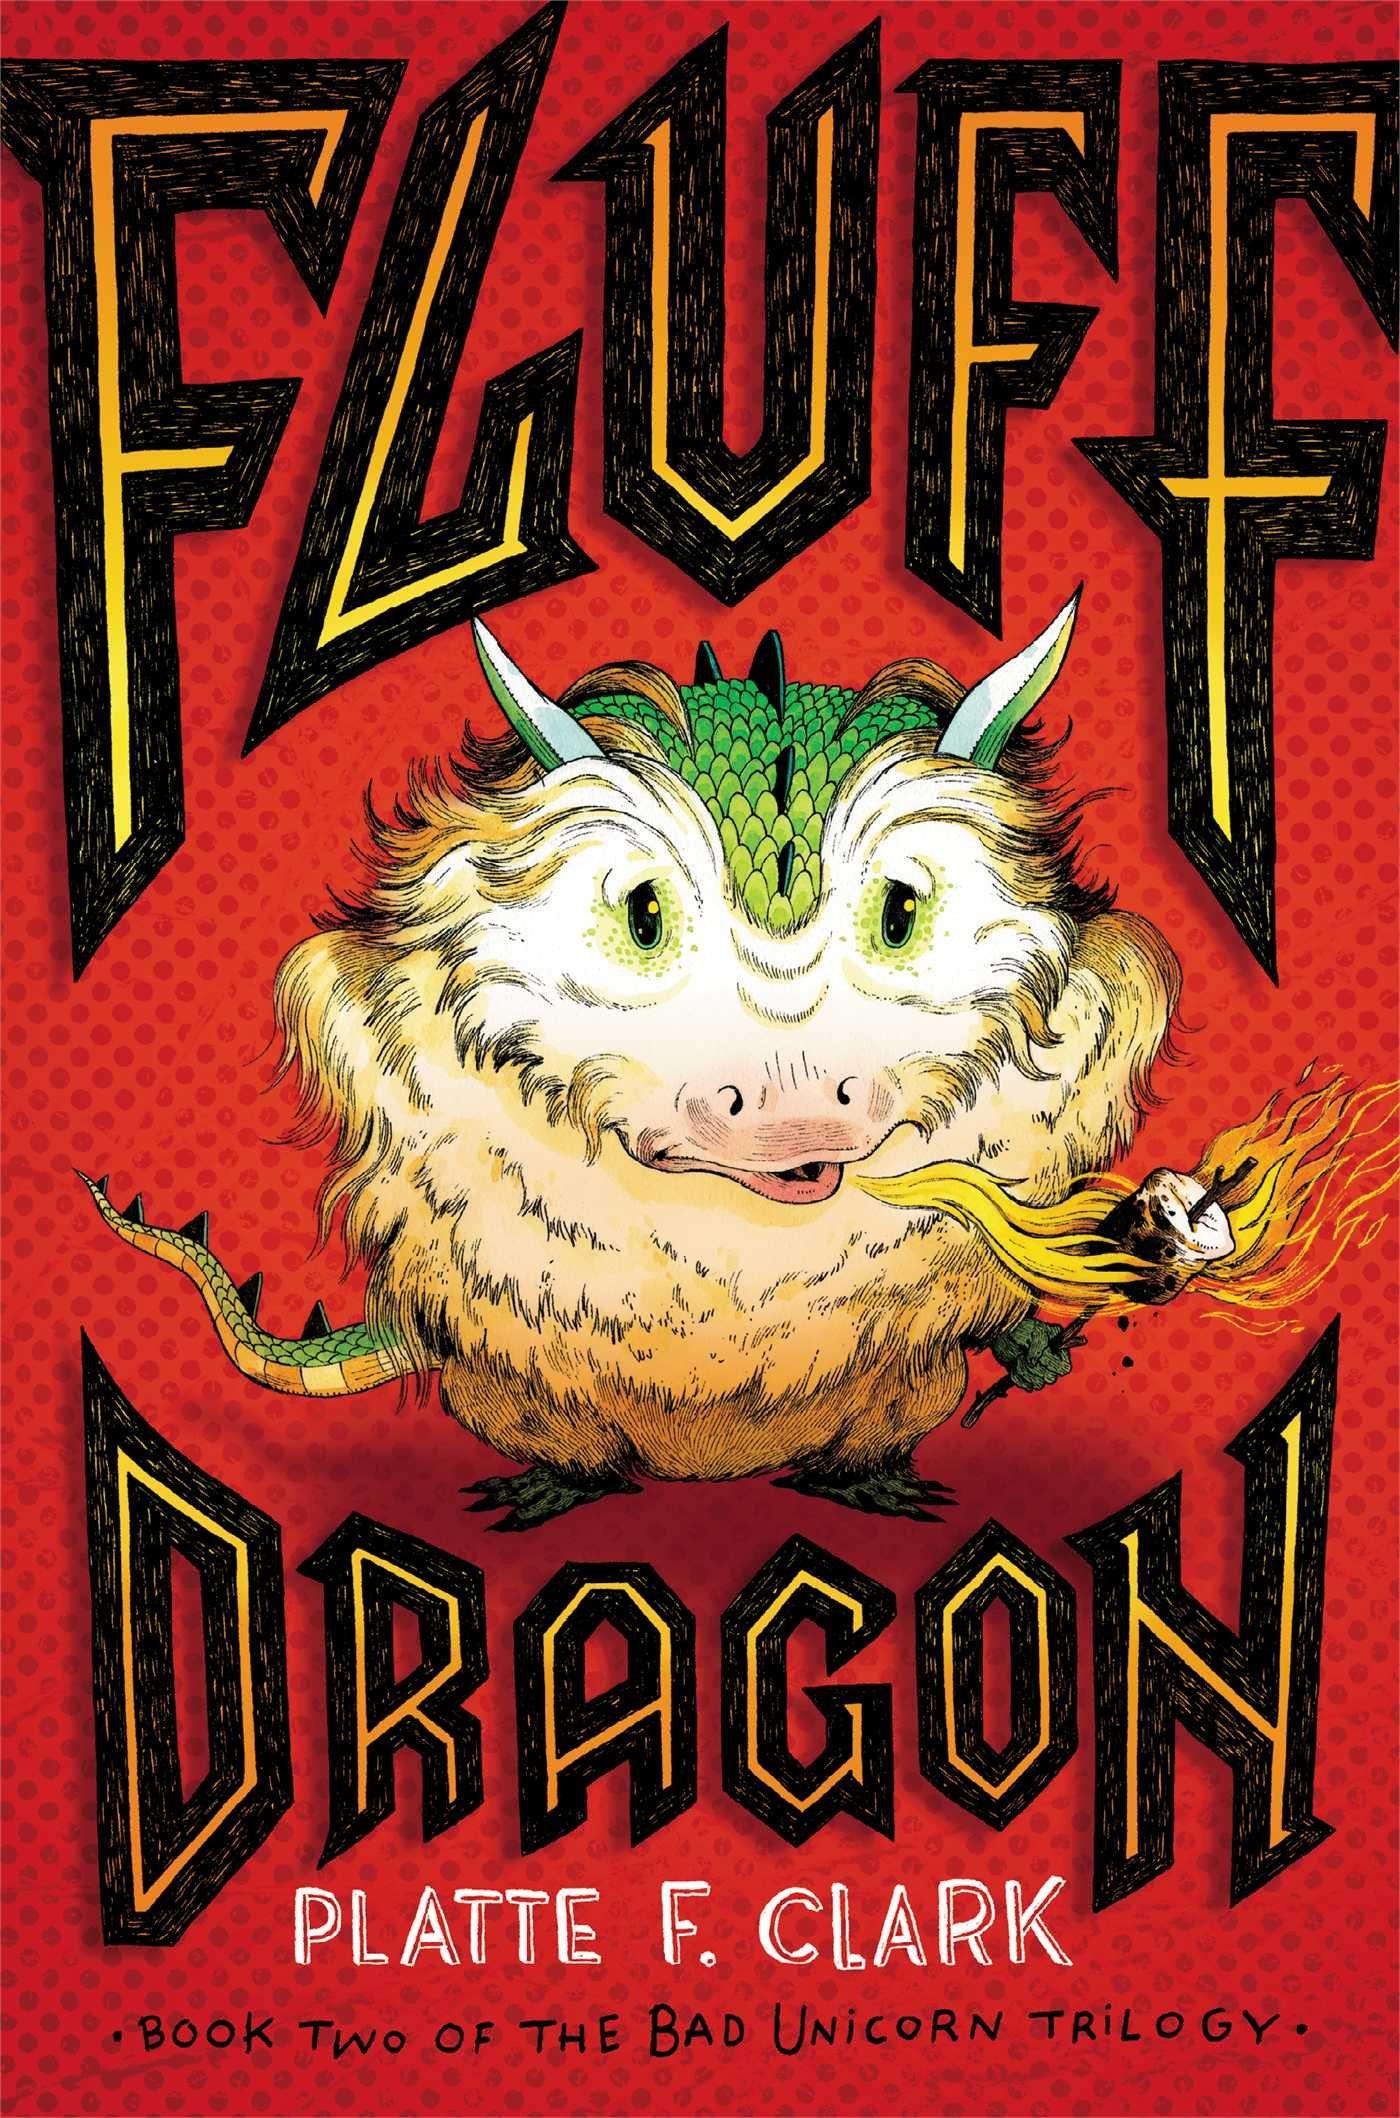 Fluff Dragon (The Bad Unicorn Trilogy): Platte F. Clark: 9781442450158:  Amazon.com: Books